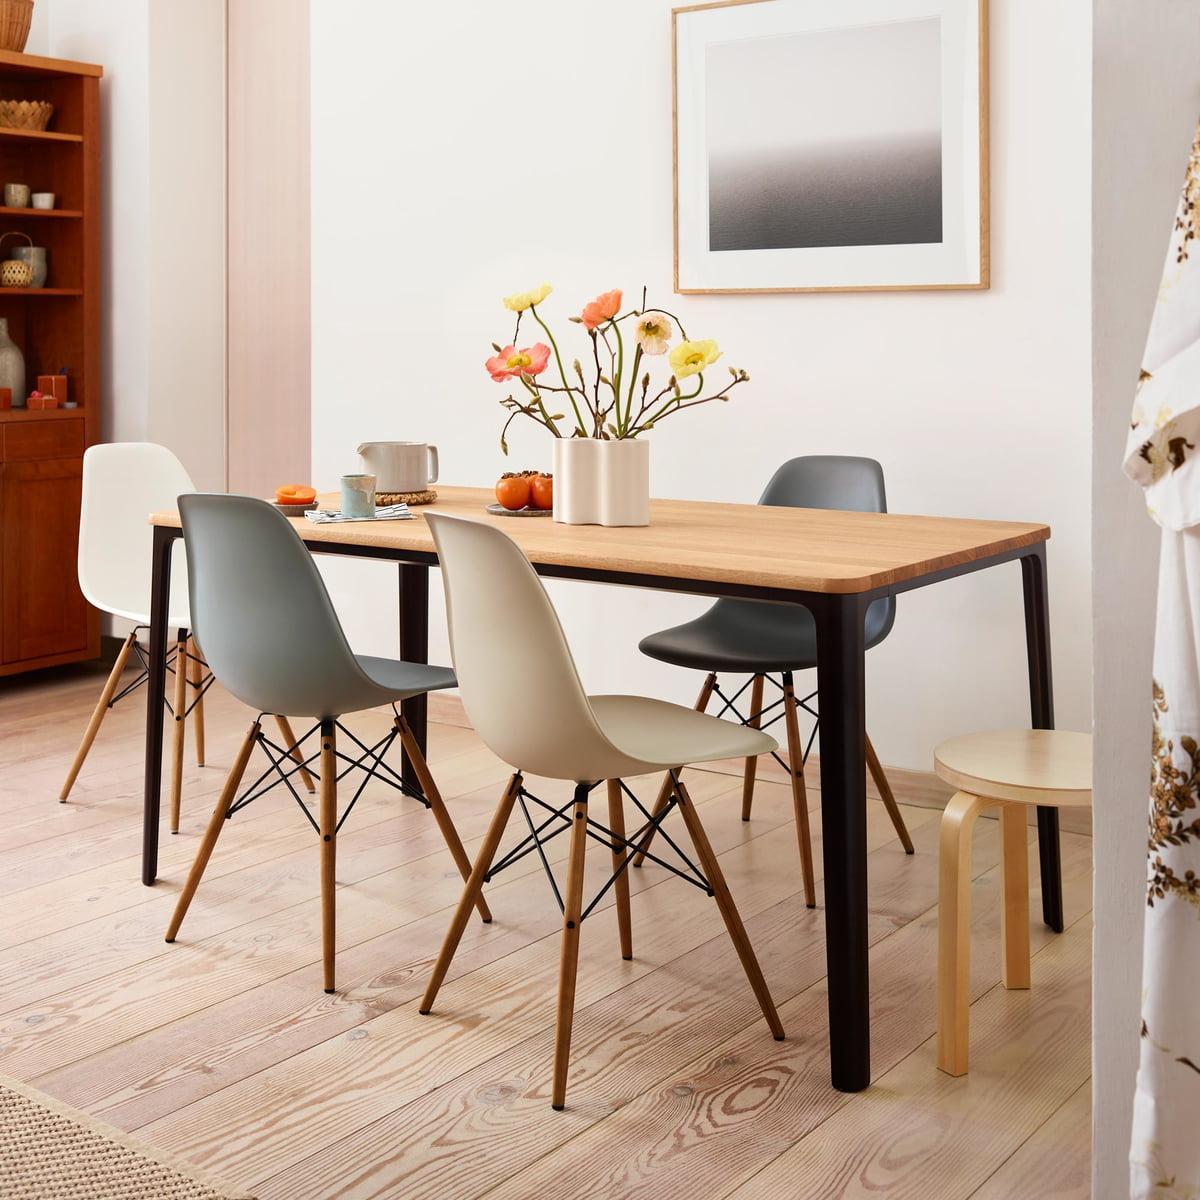 Vitra Stühle Esszimmer